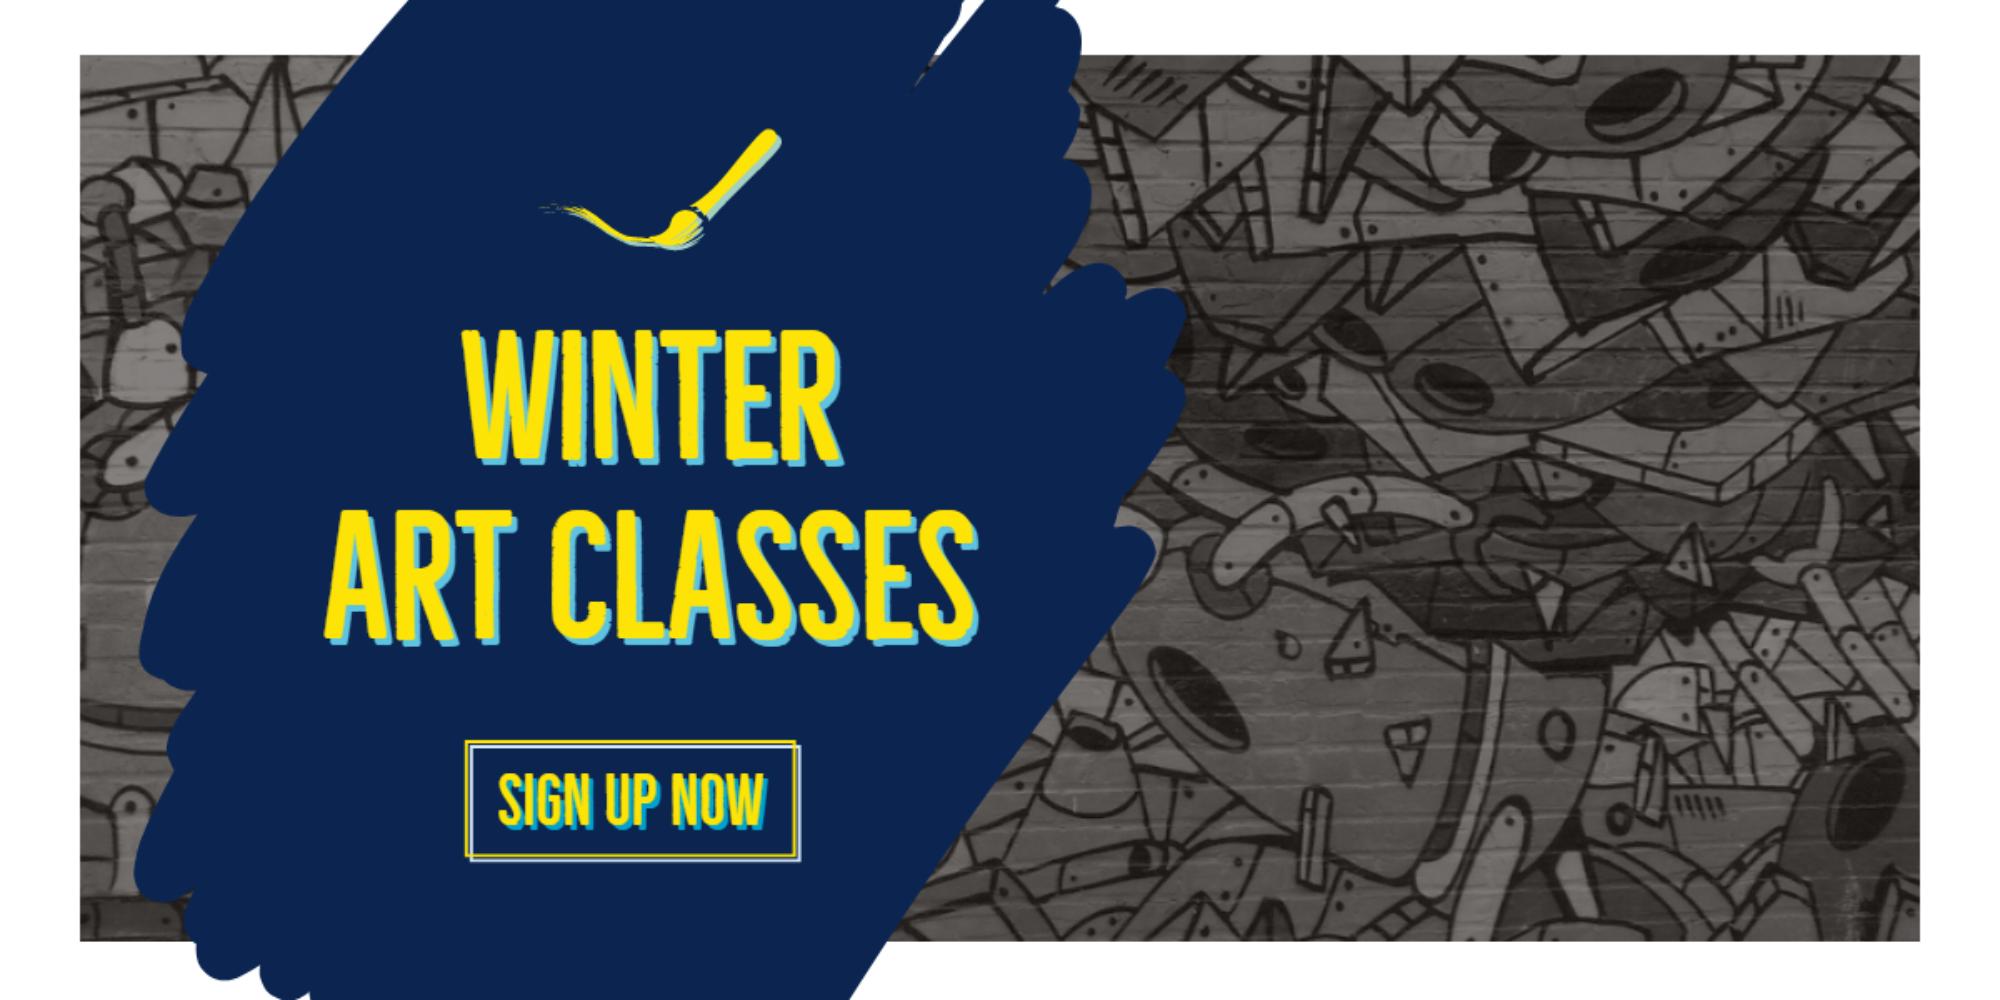 Winter Art Classes